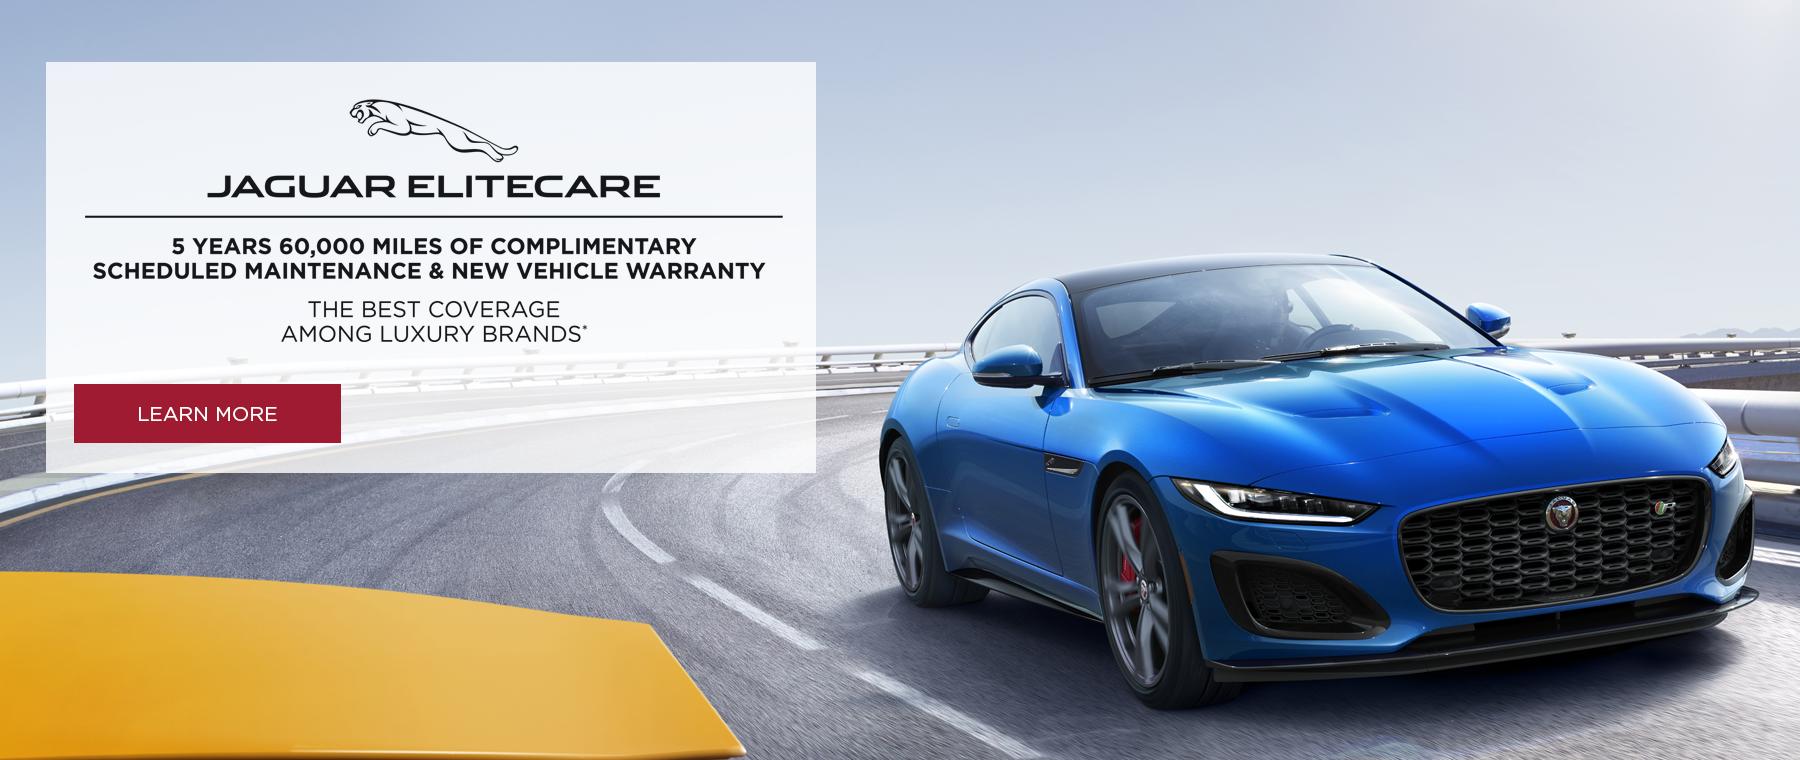 Jaguar EliteCare DI